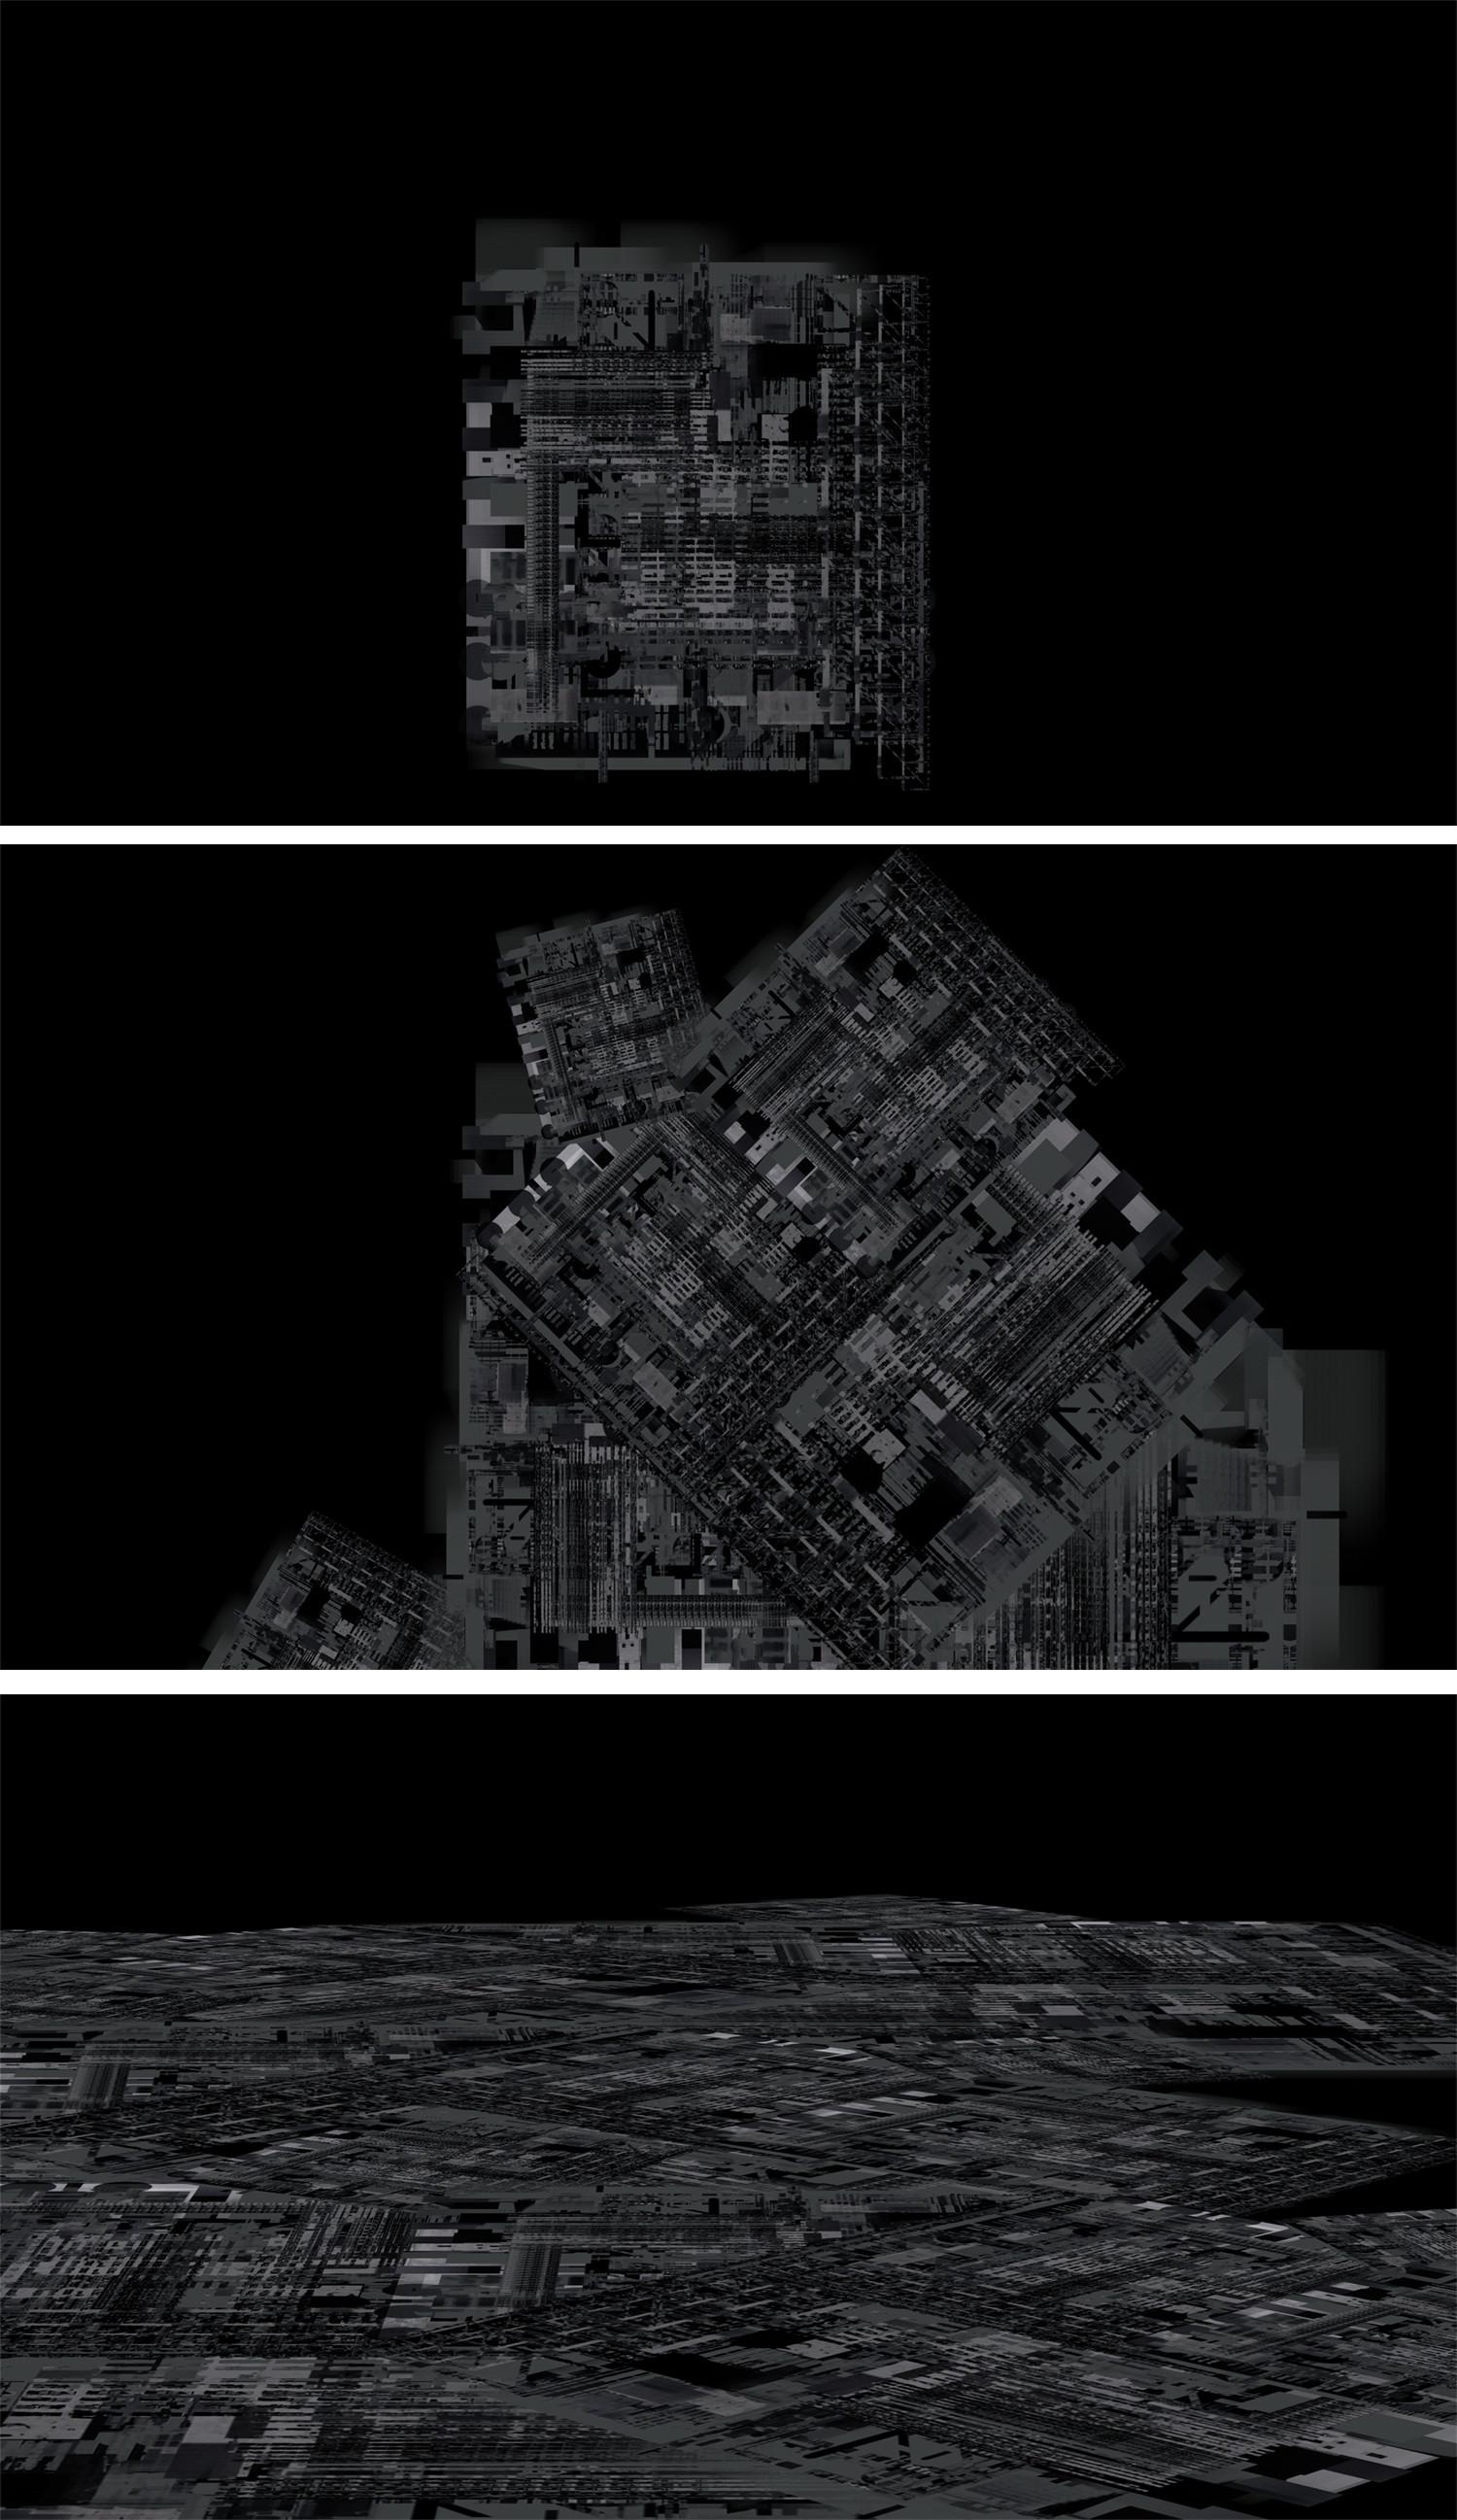 Nicodemus mattisson cityexplanation1